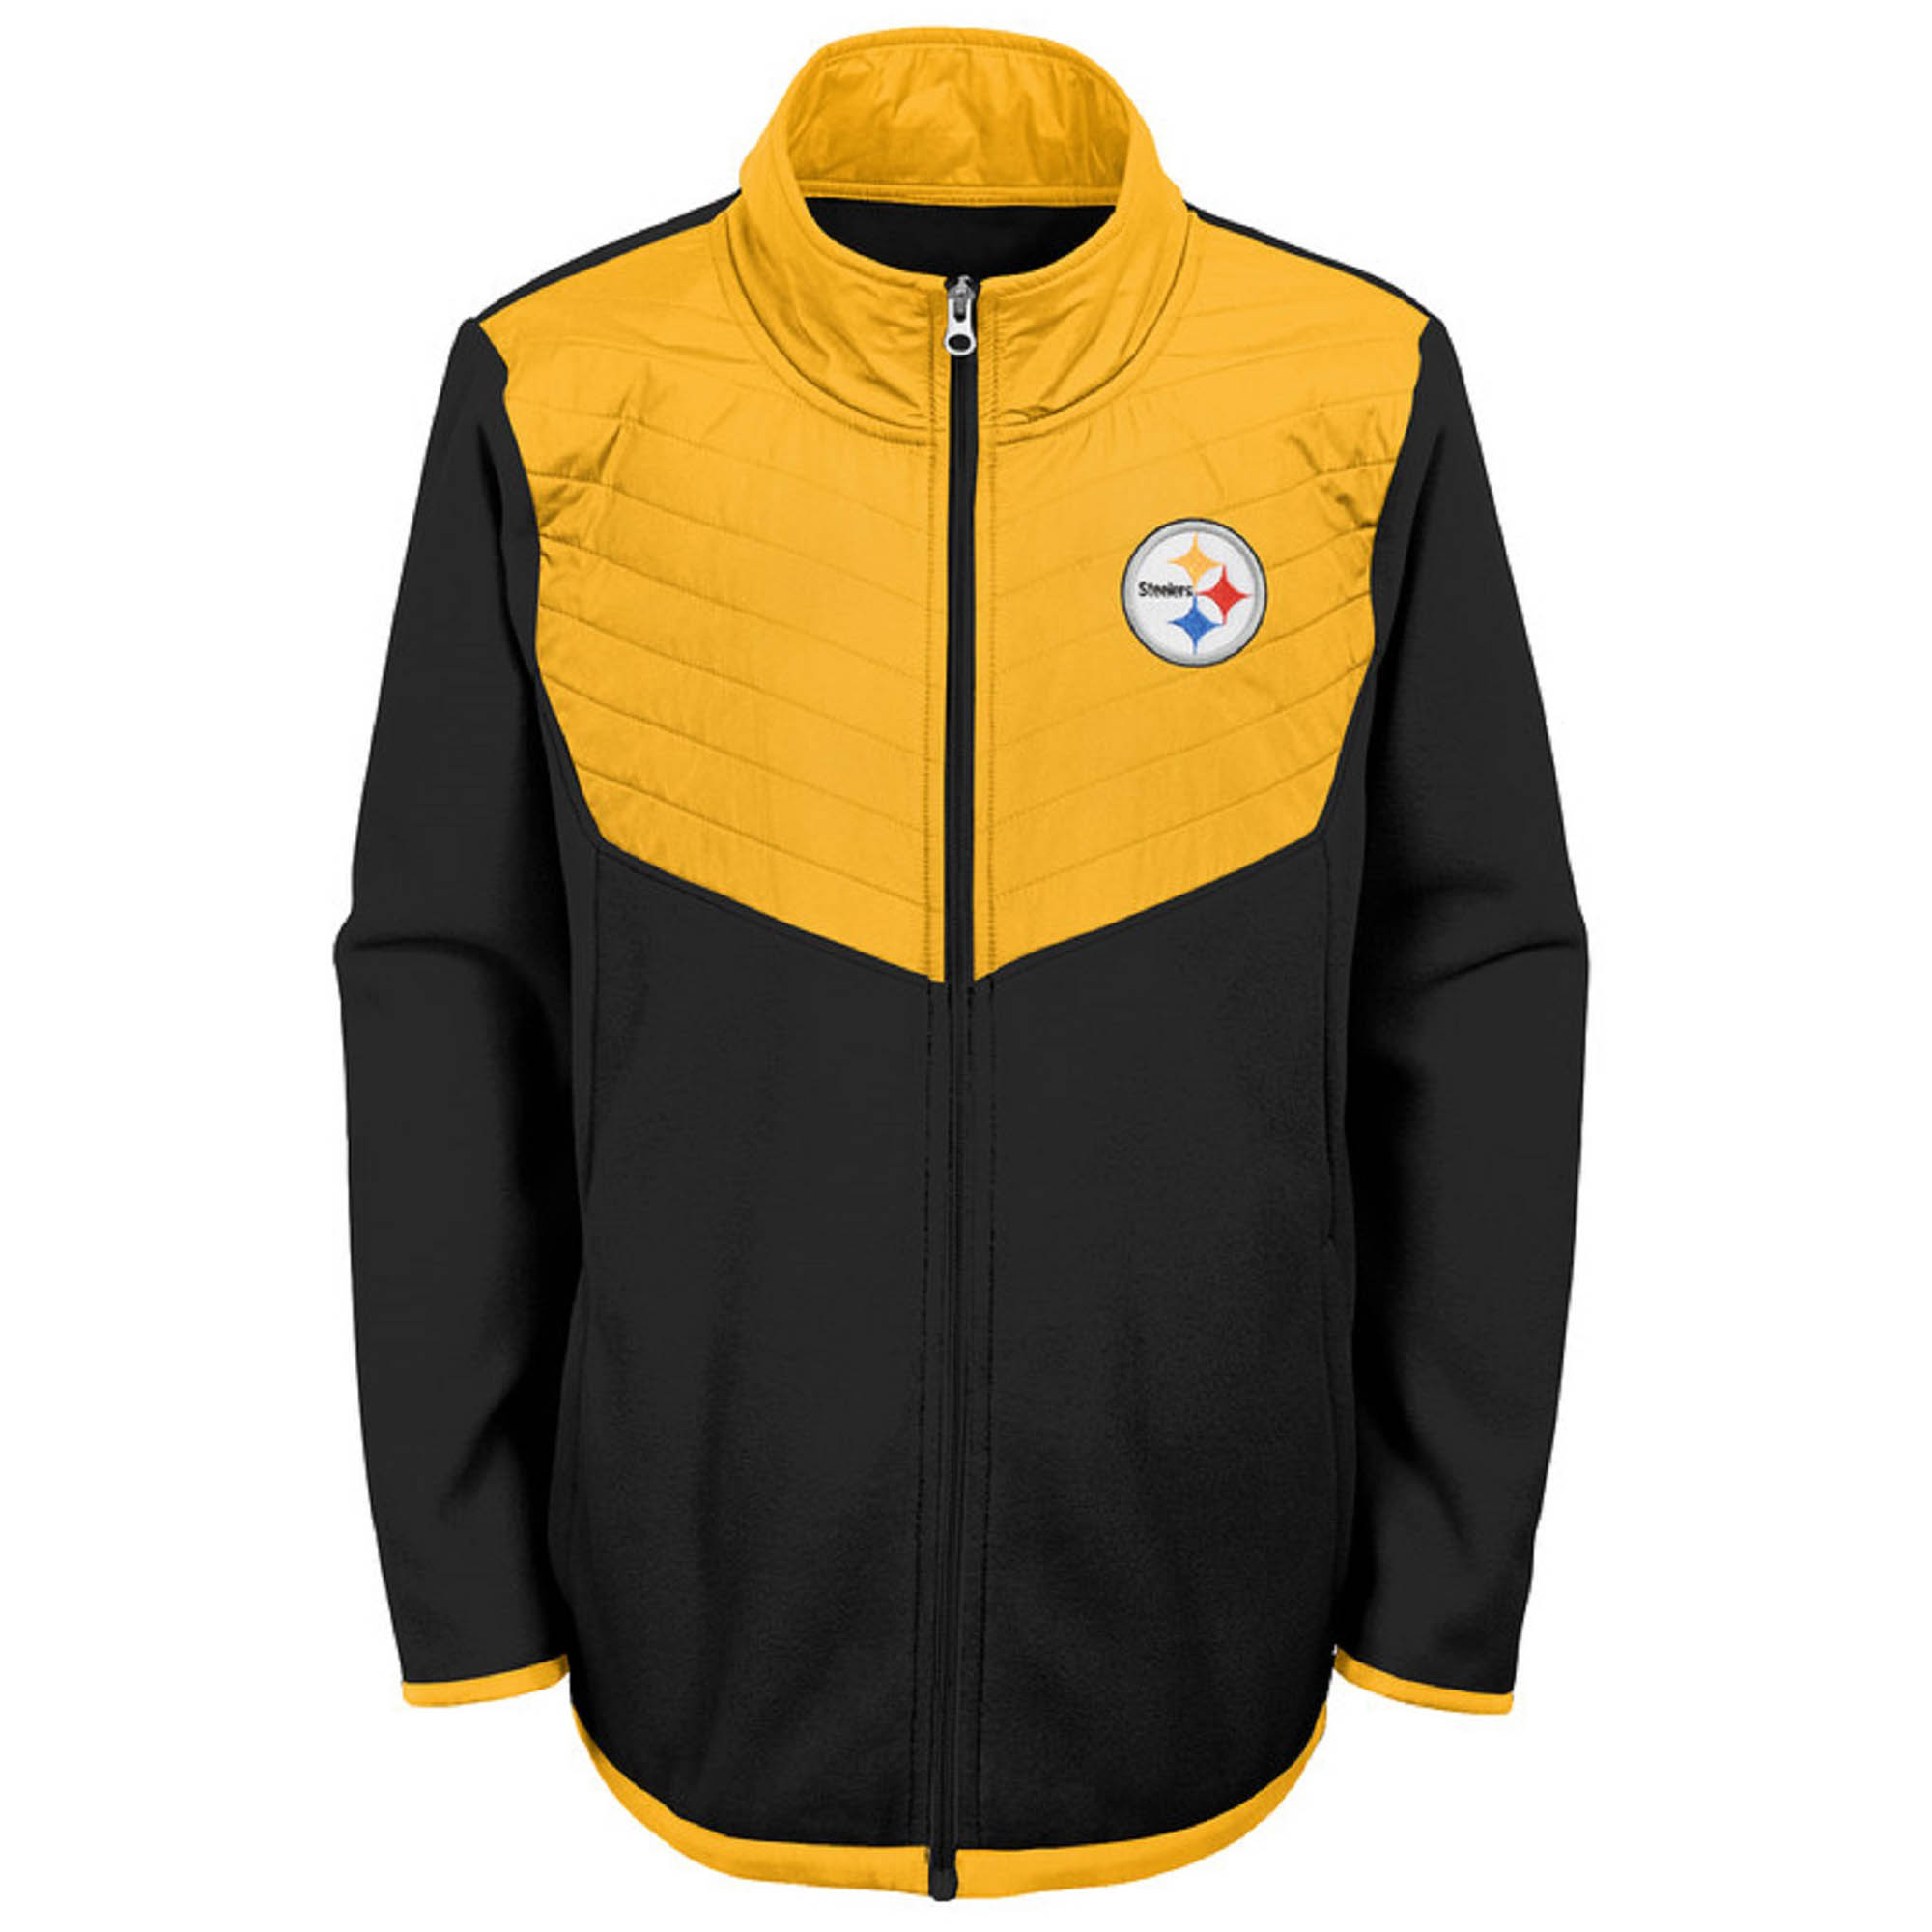 Youth Black/Gold Pittsburgh Steelers Polar Full-Zip Jacket